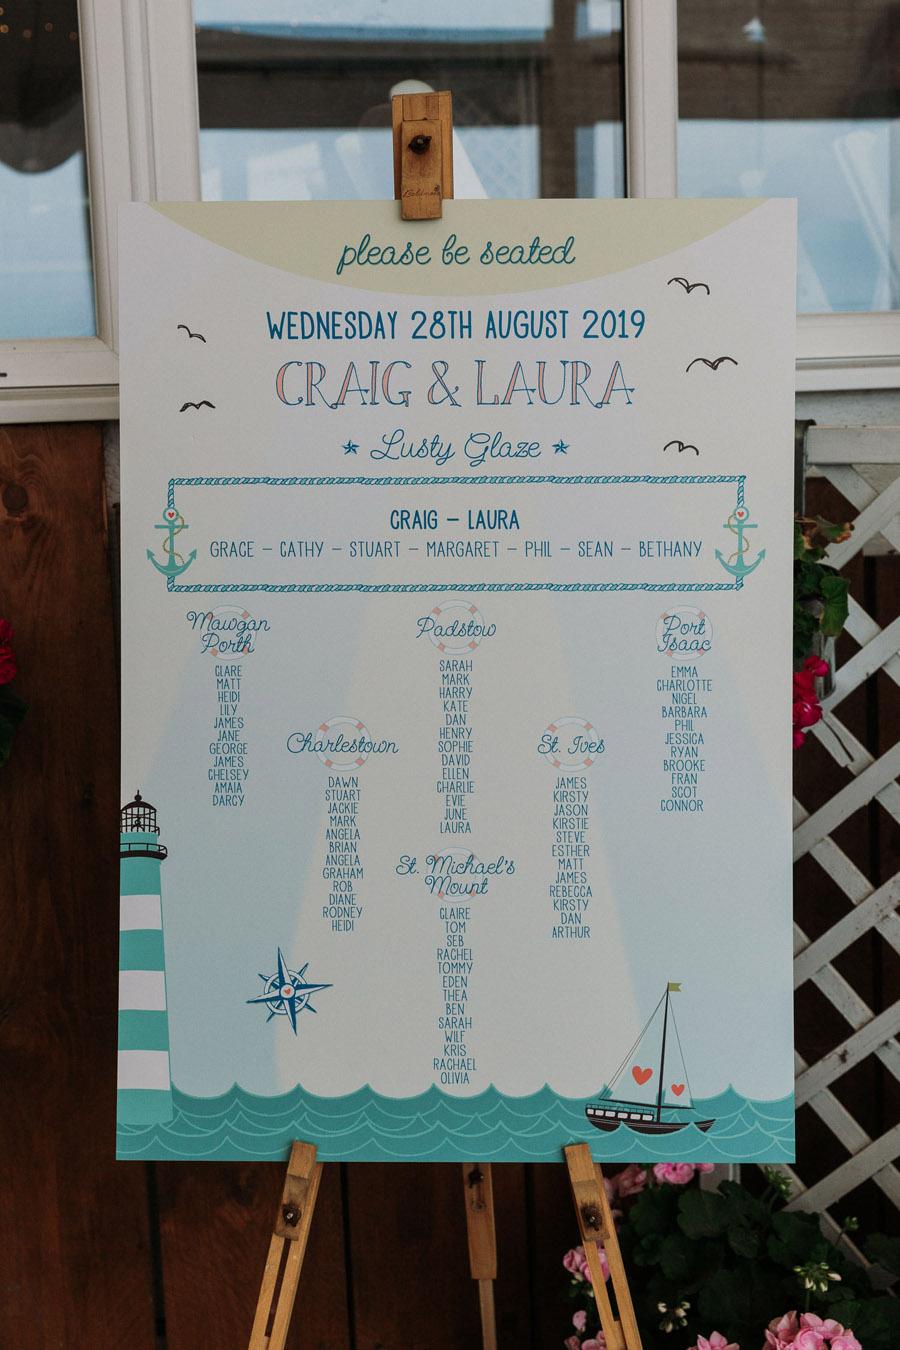 Laura & Craig's lovely English wedding at Lusty Glaze, with Alexa Poppe Photography (7)